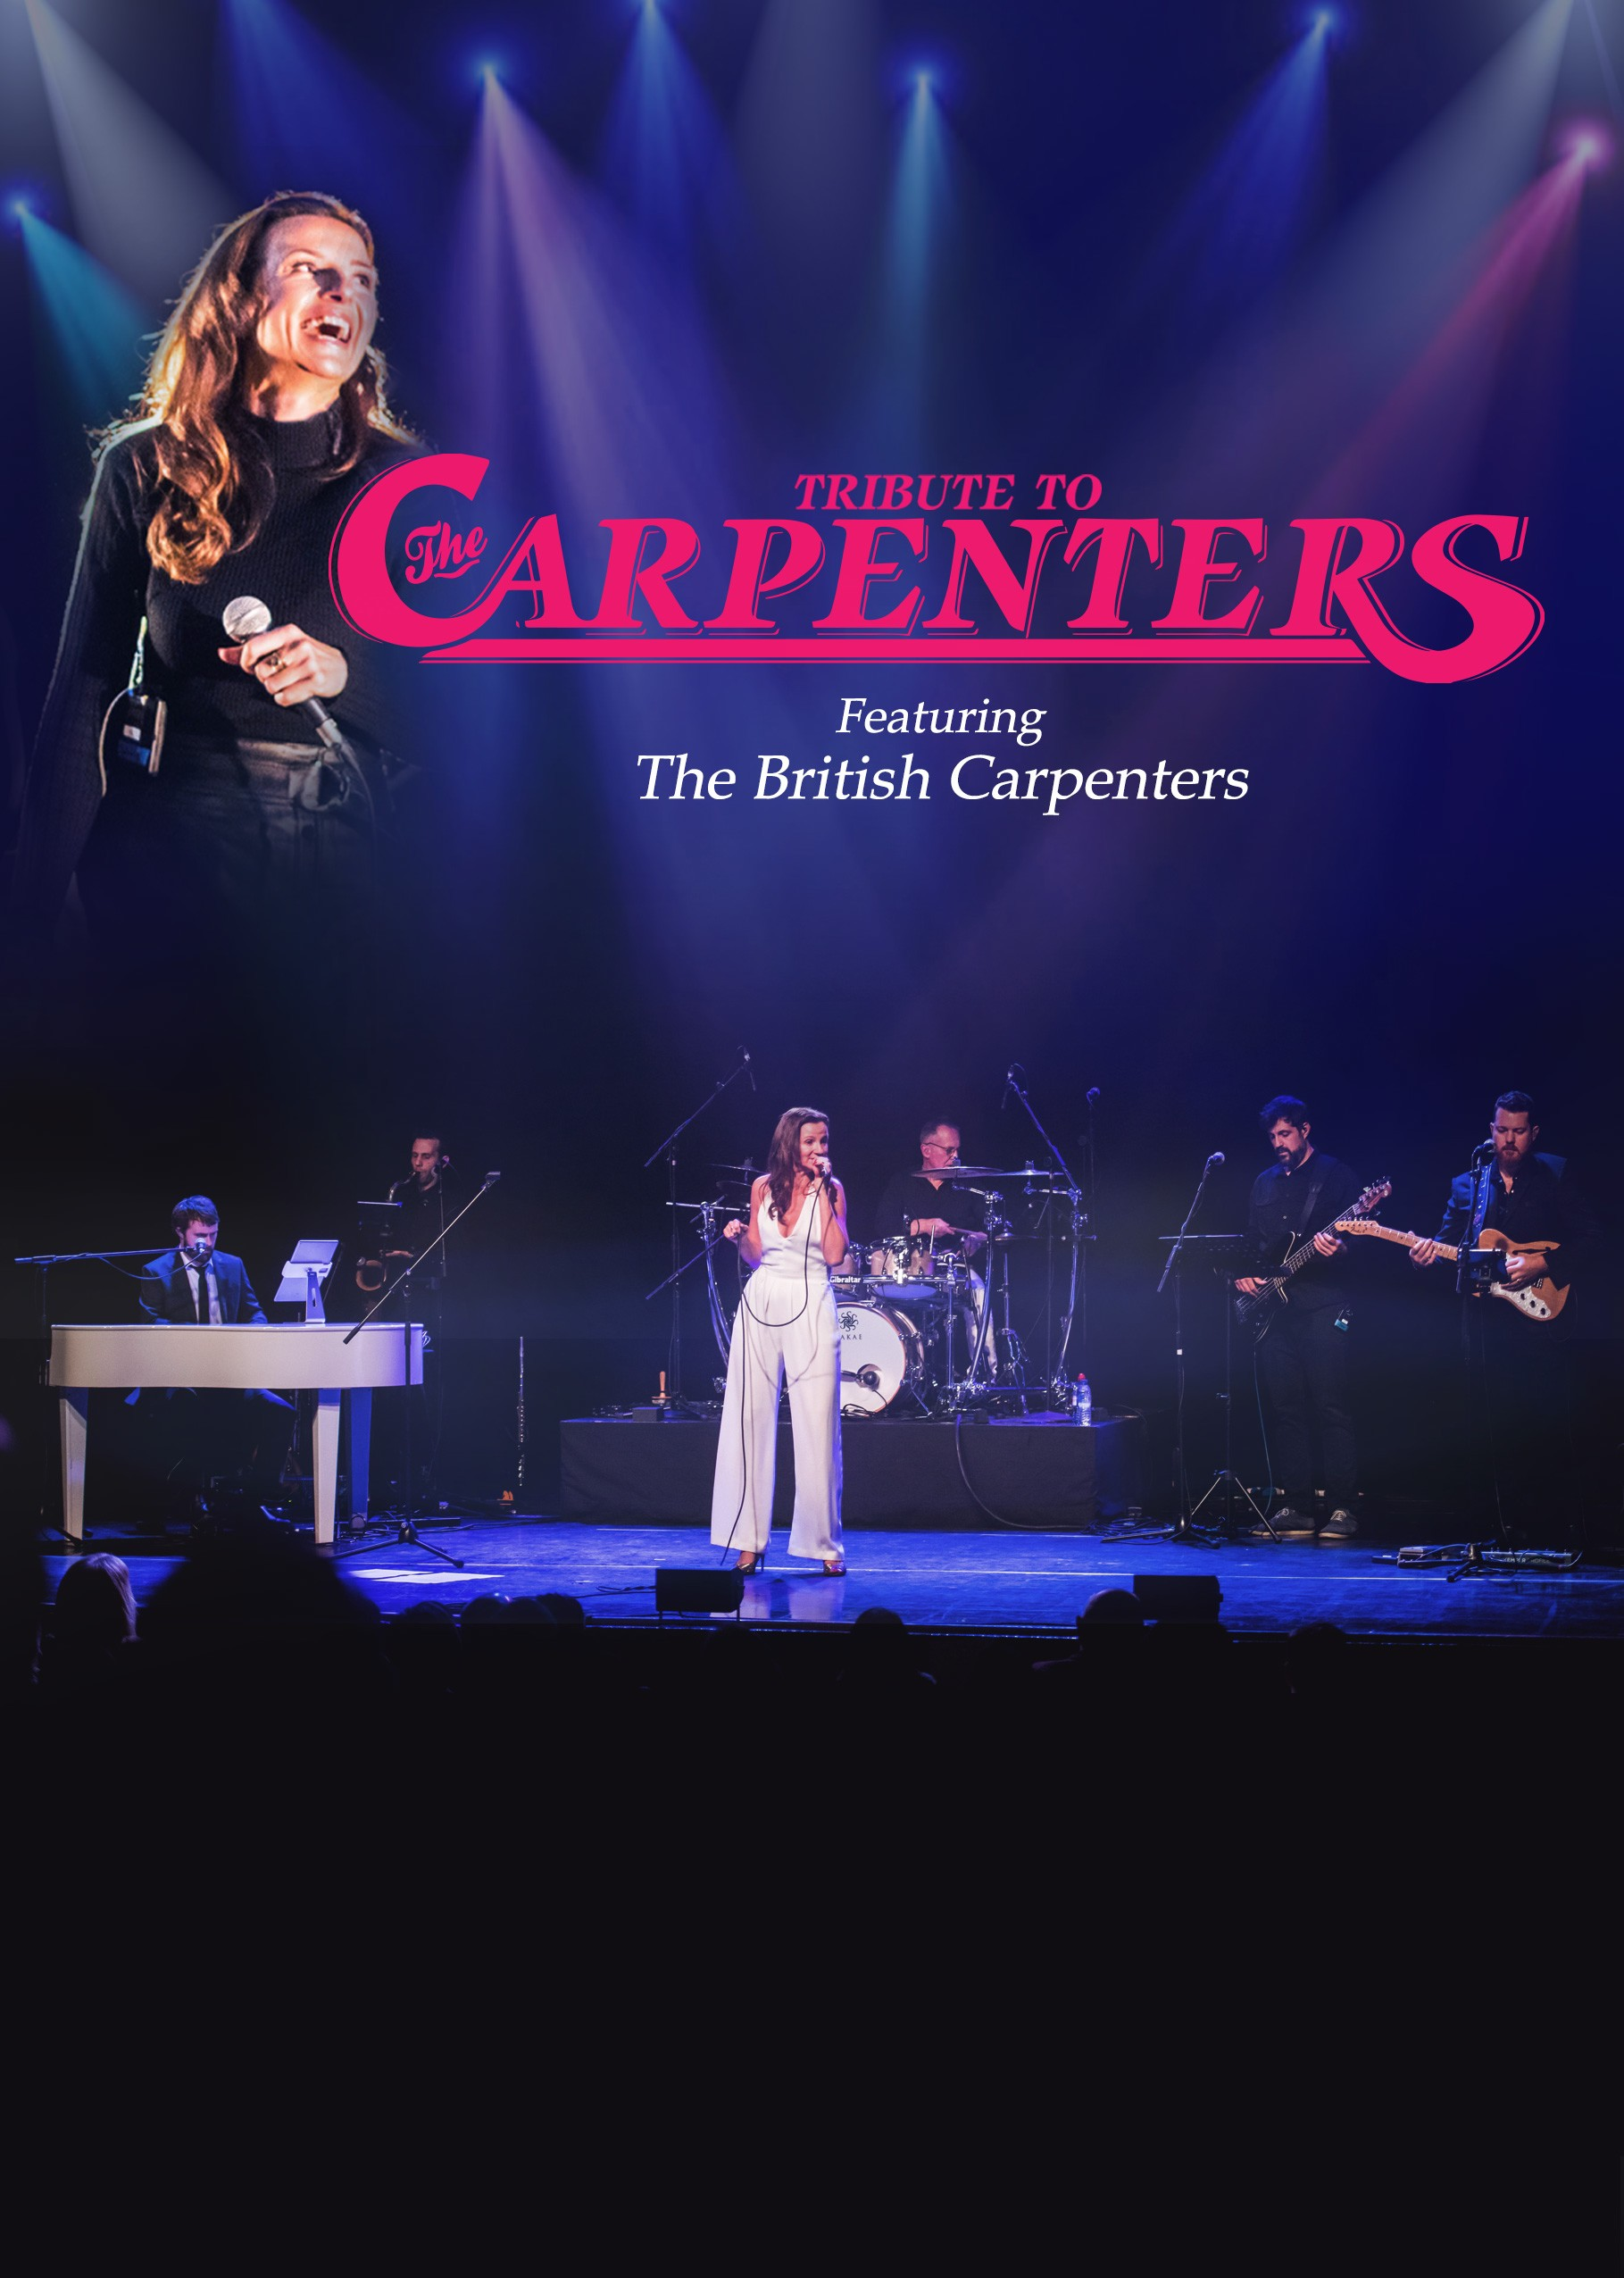 Tribute to the Carpenters featuring The British Carpenters